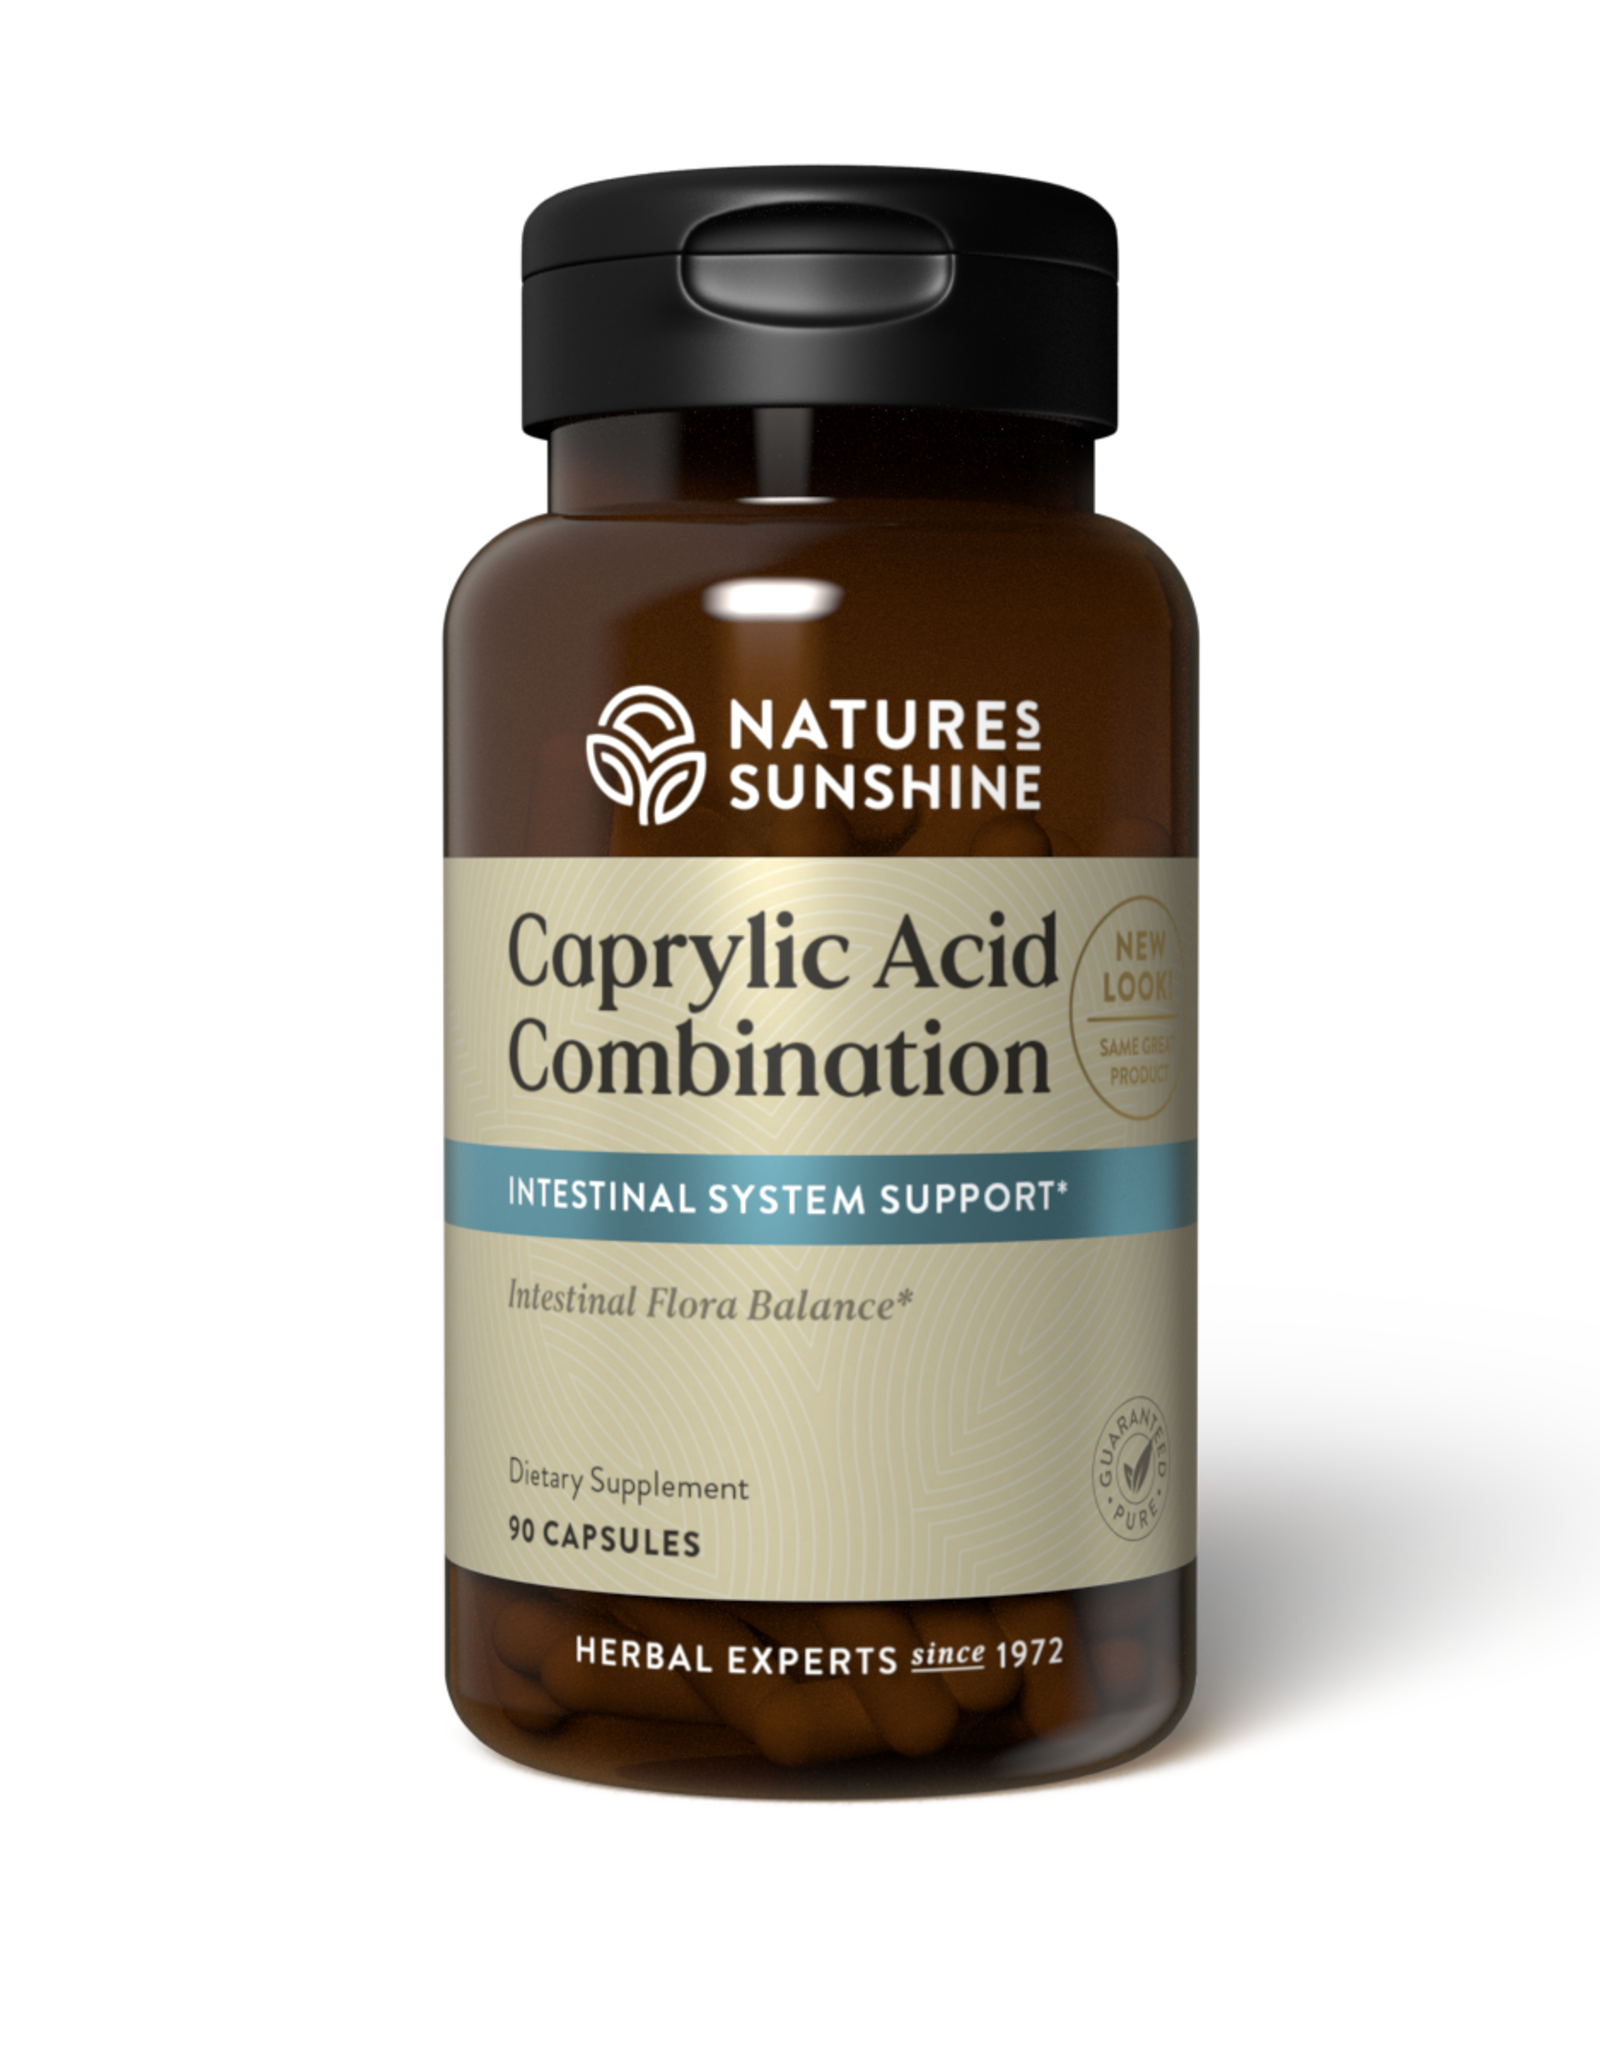 Nature's Sunshine Caprylic Acid Combination (90 caps)